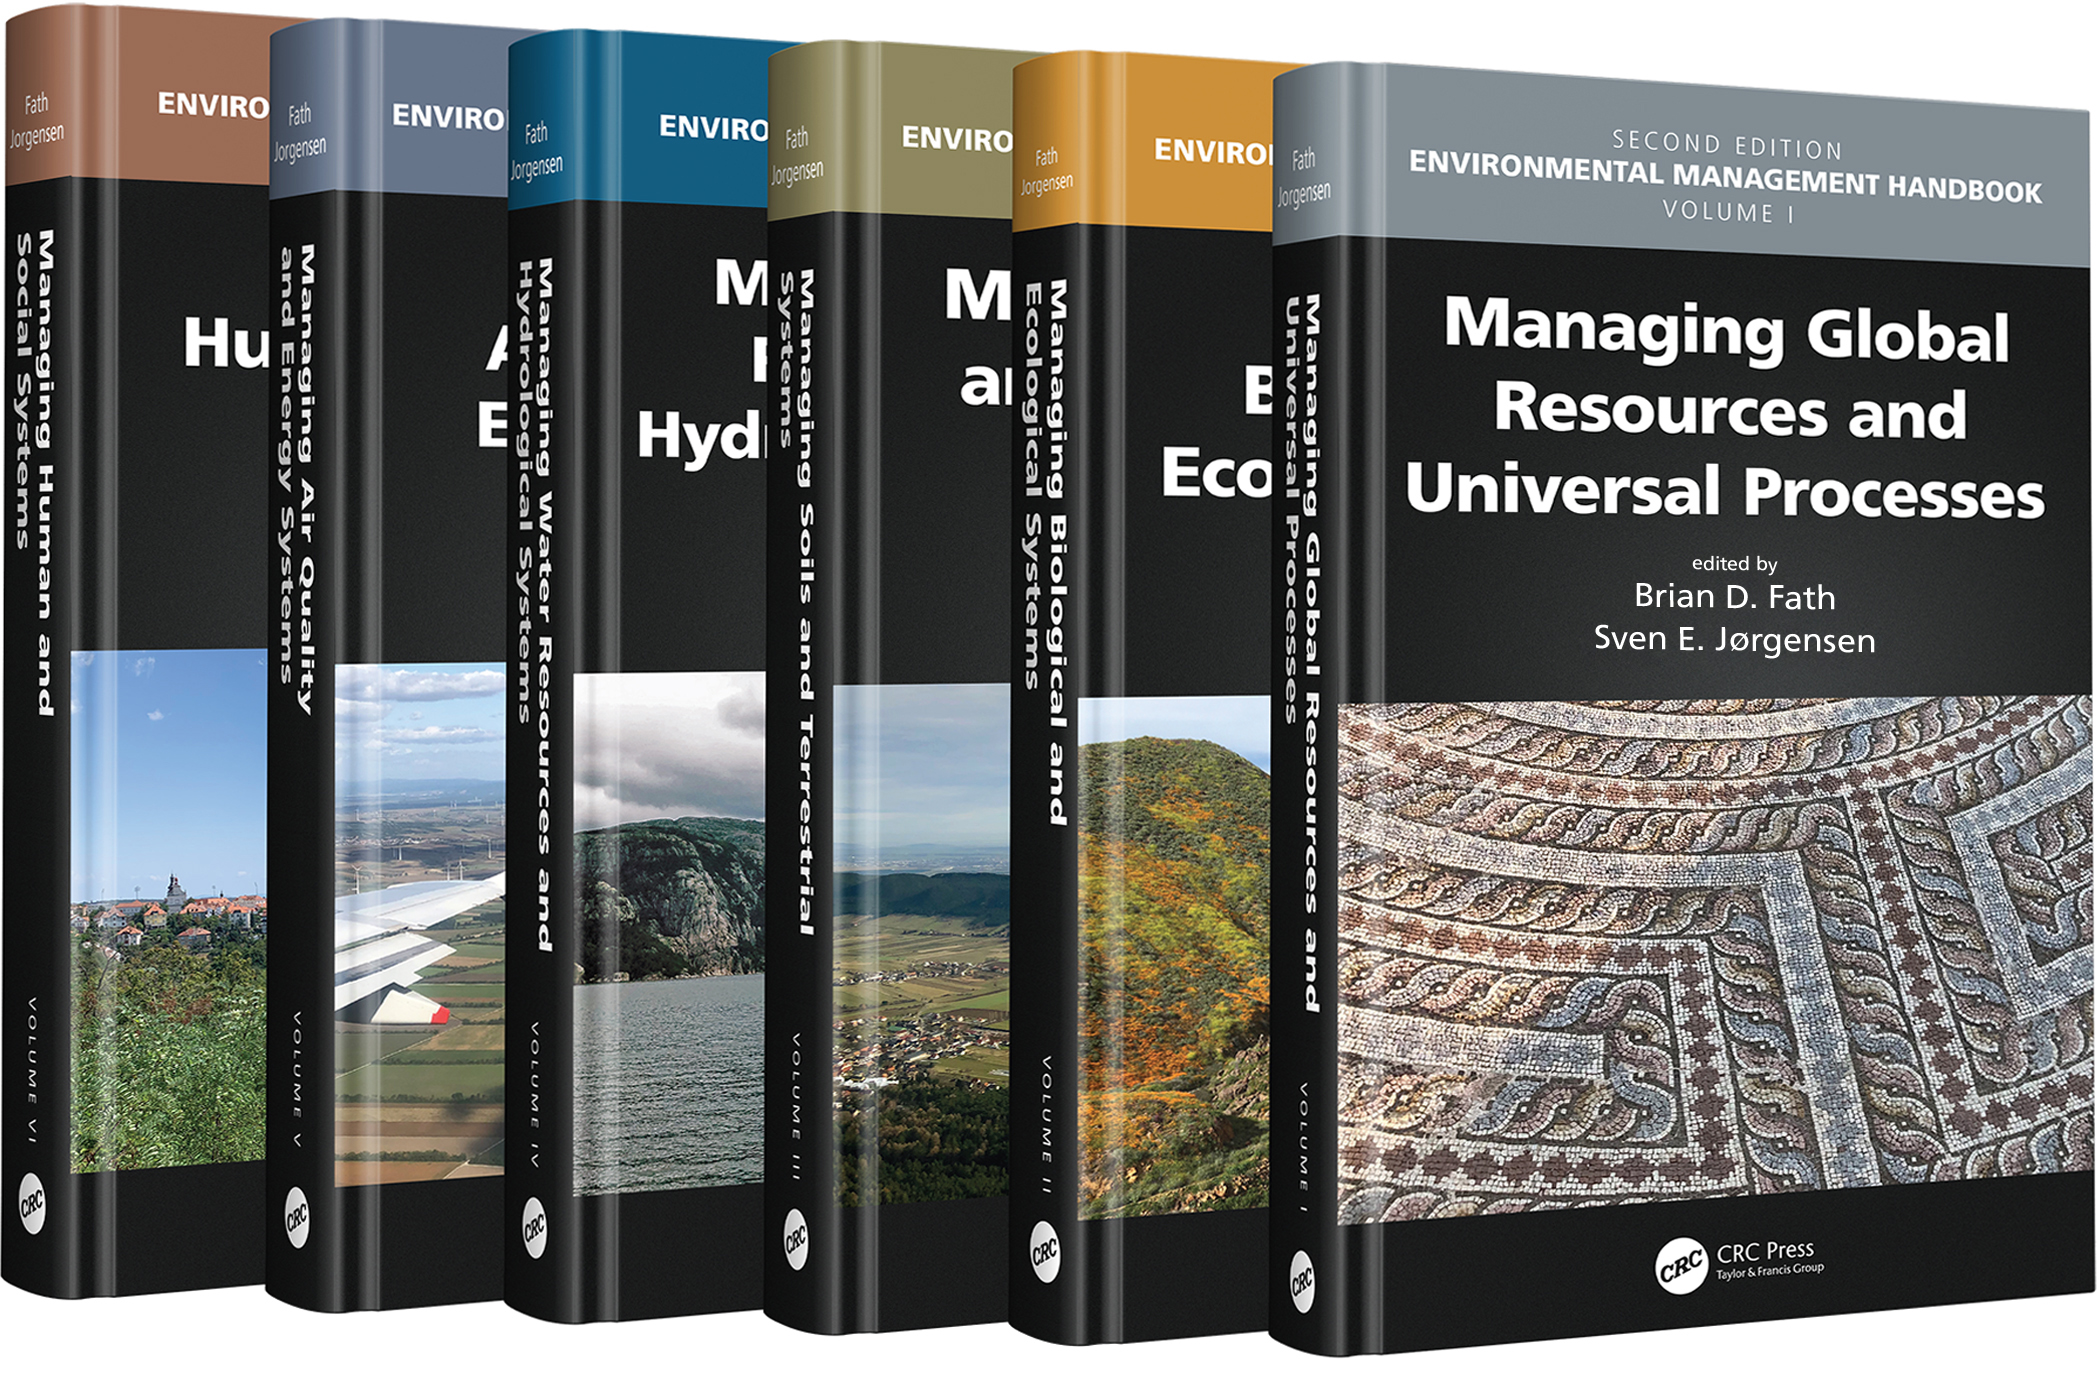 Environmental Management Handbook, Second Edition – Six Volume Set book cover